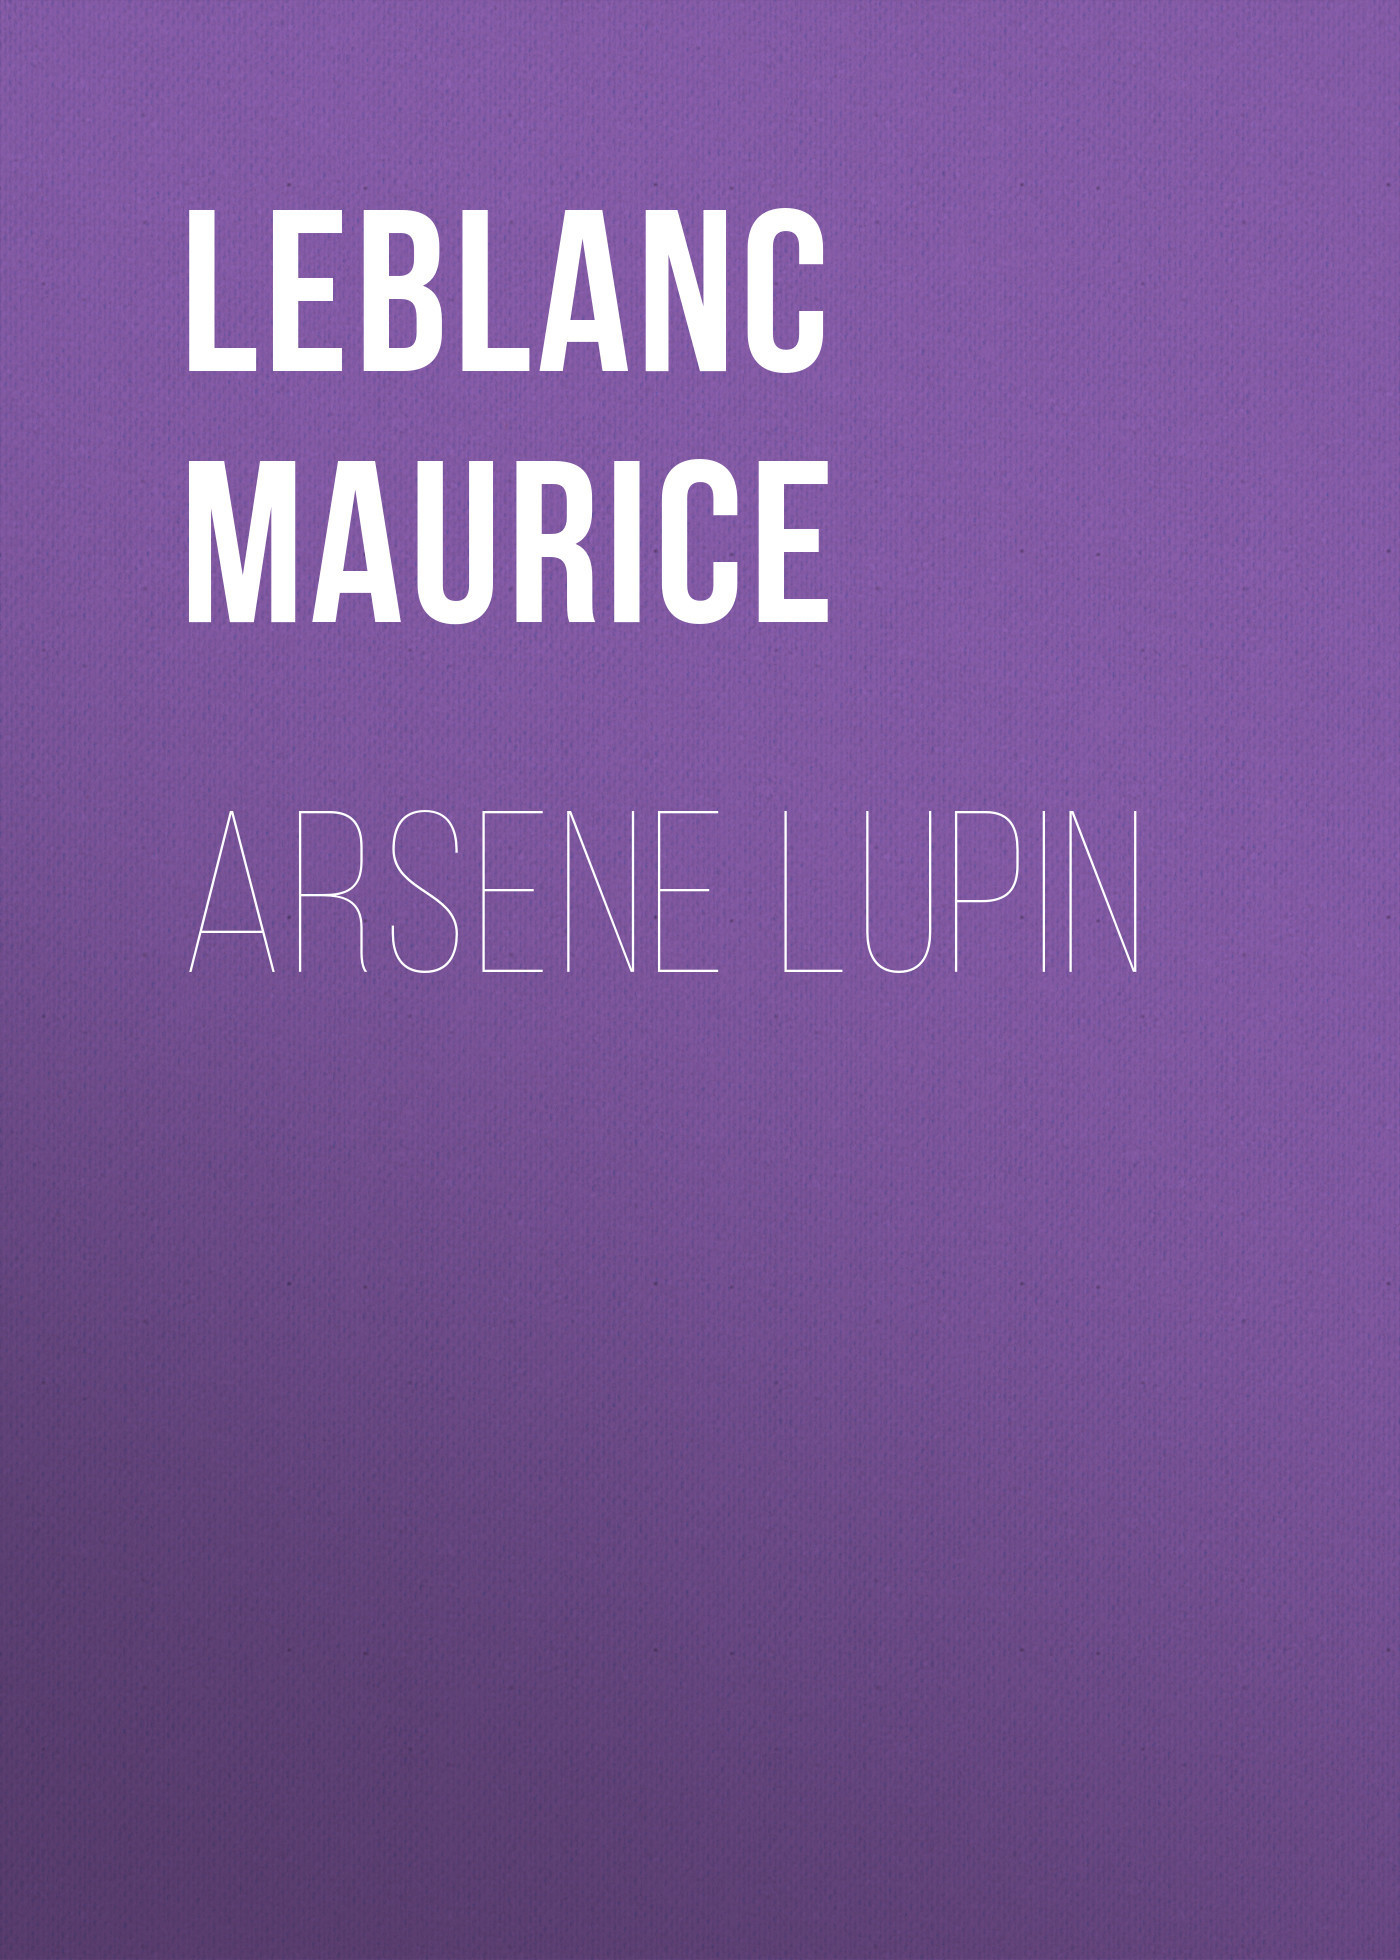 Leblanc Maurice Arsene Lupin leblanc maurice the confessions of arsène lupin